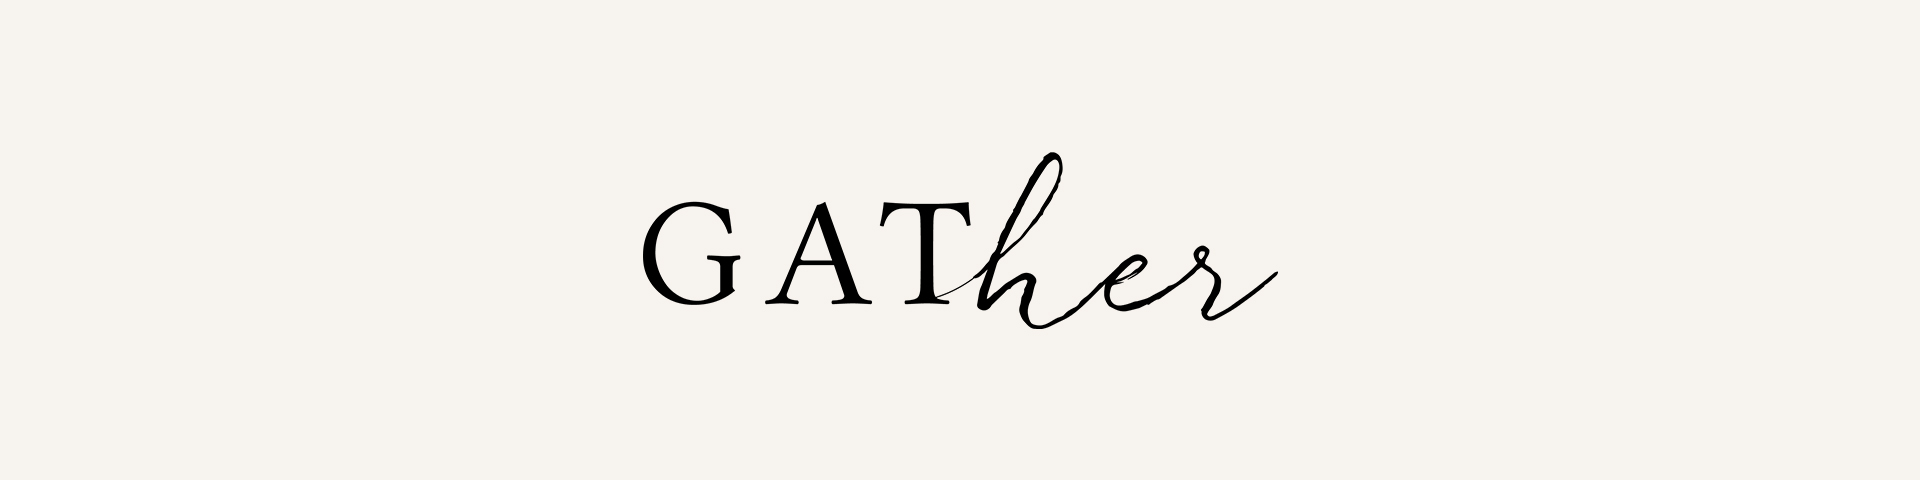 gatherw Main Logo.jpg